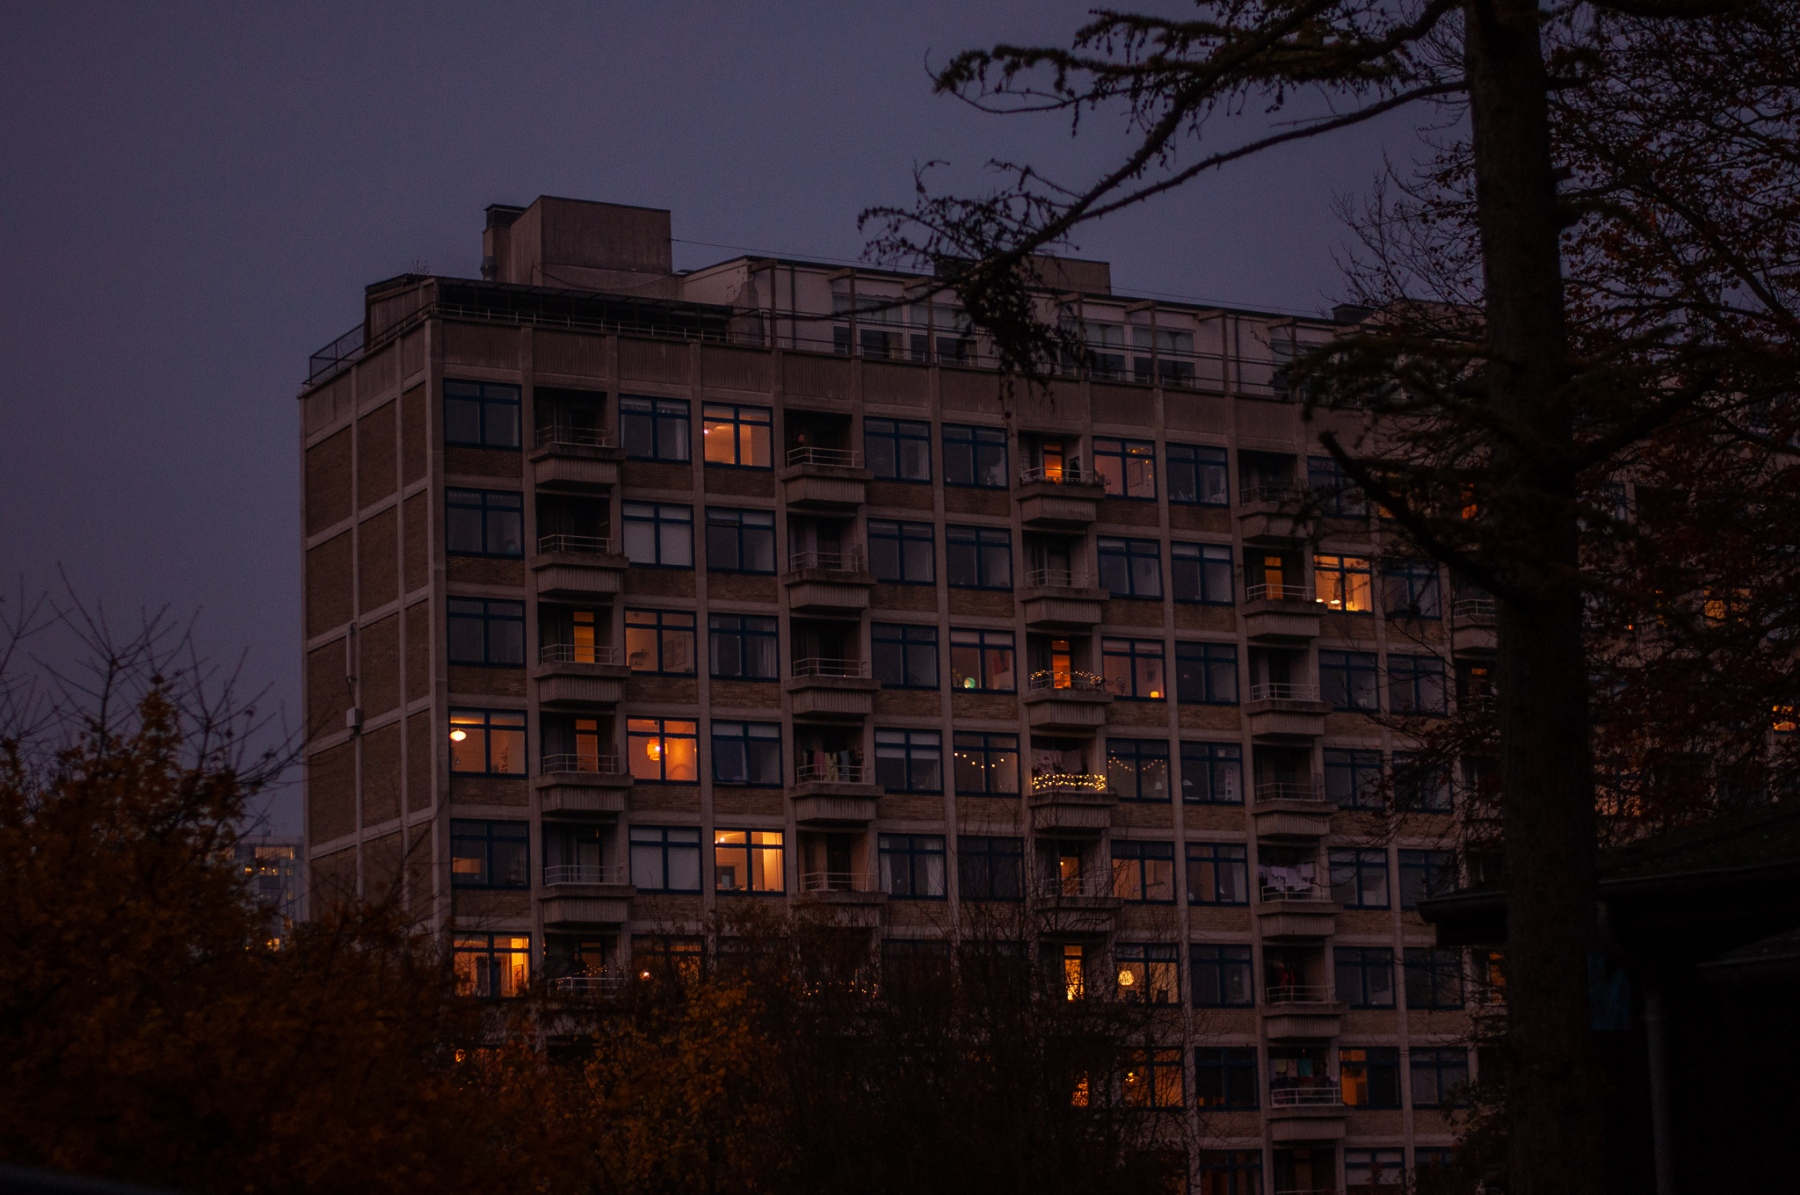 anja-blaksmark-rektorparken